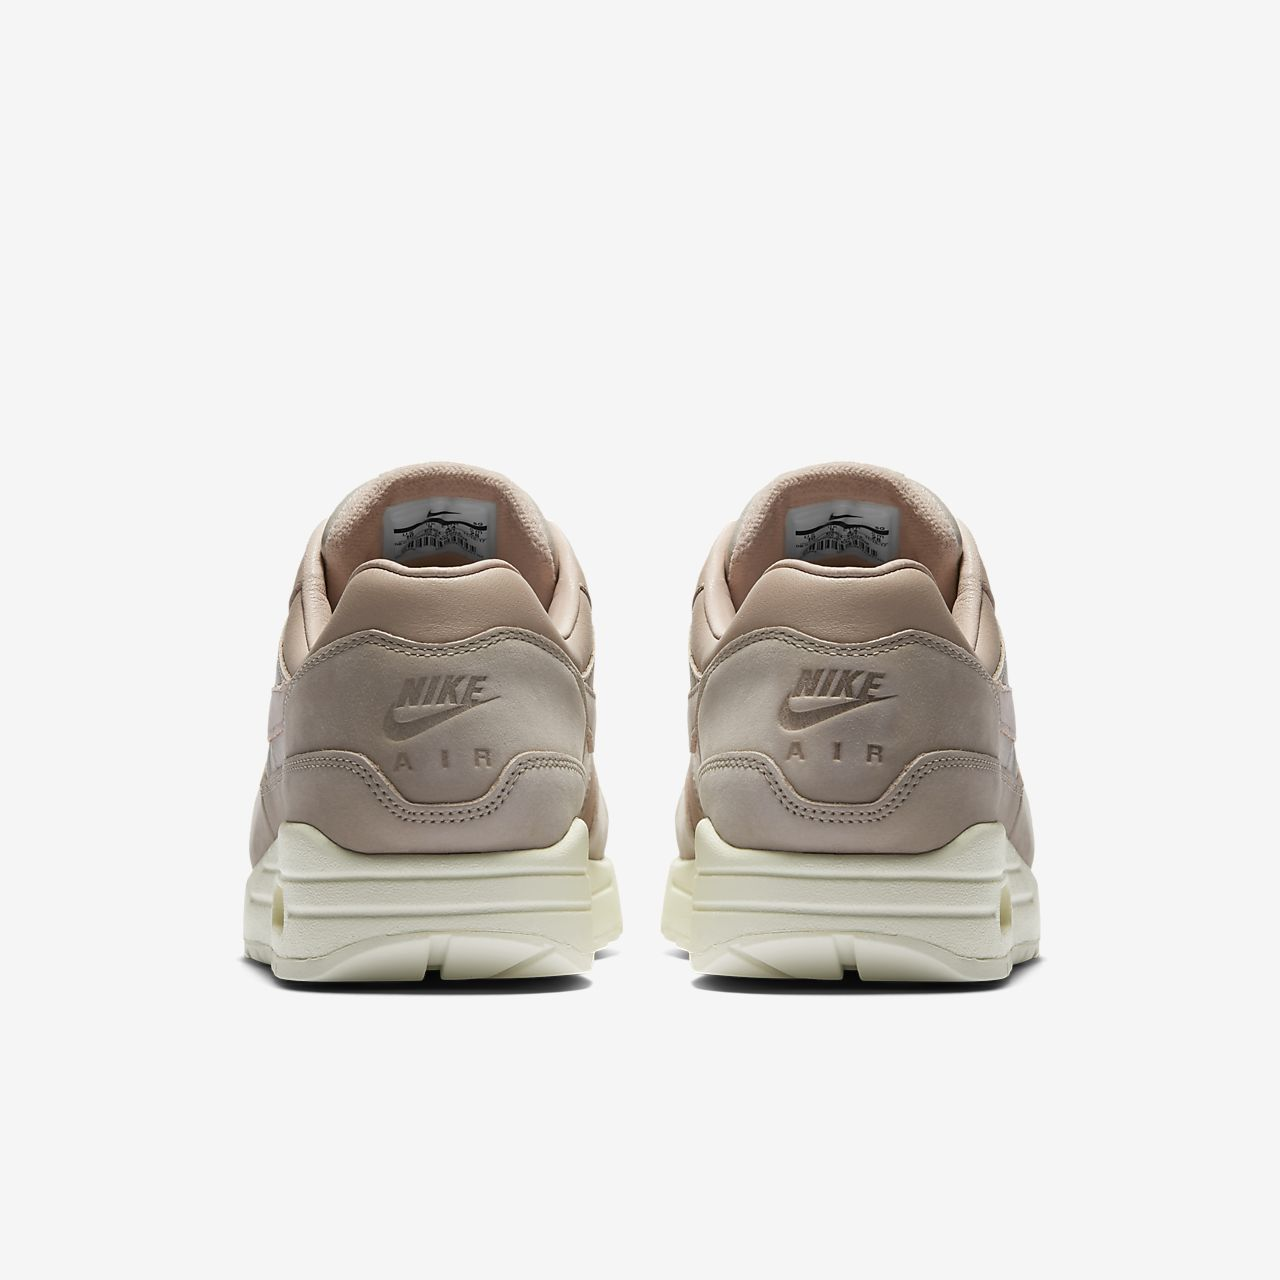 Nike Air Max 1 Pinnacle Herrenschuh